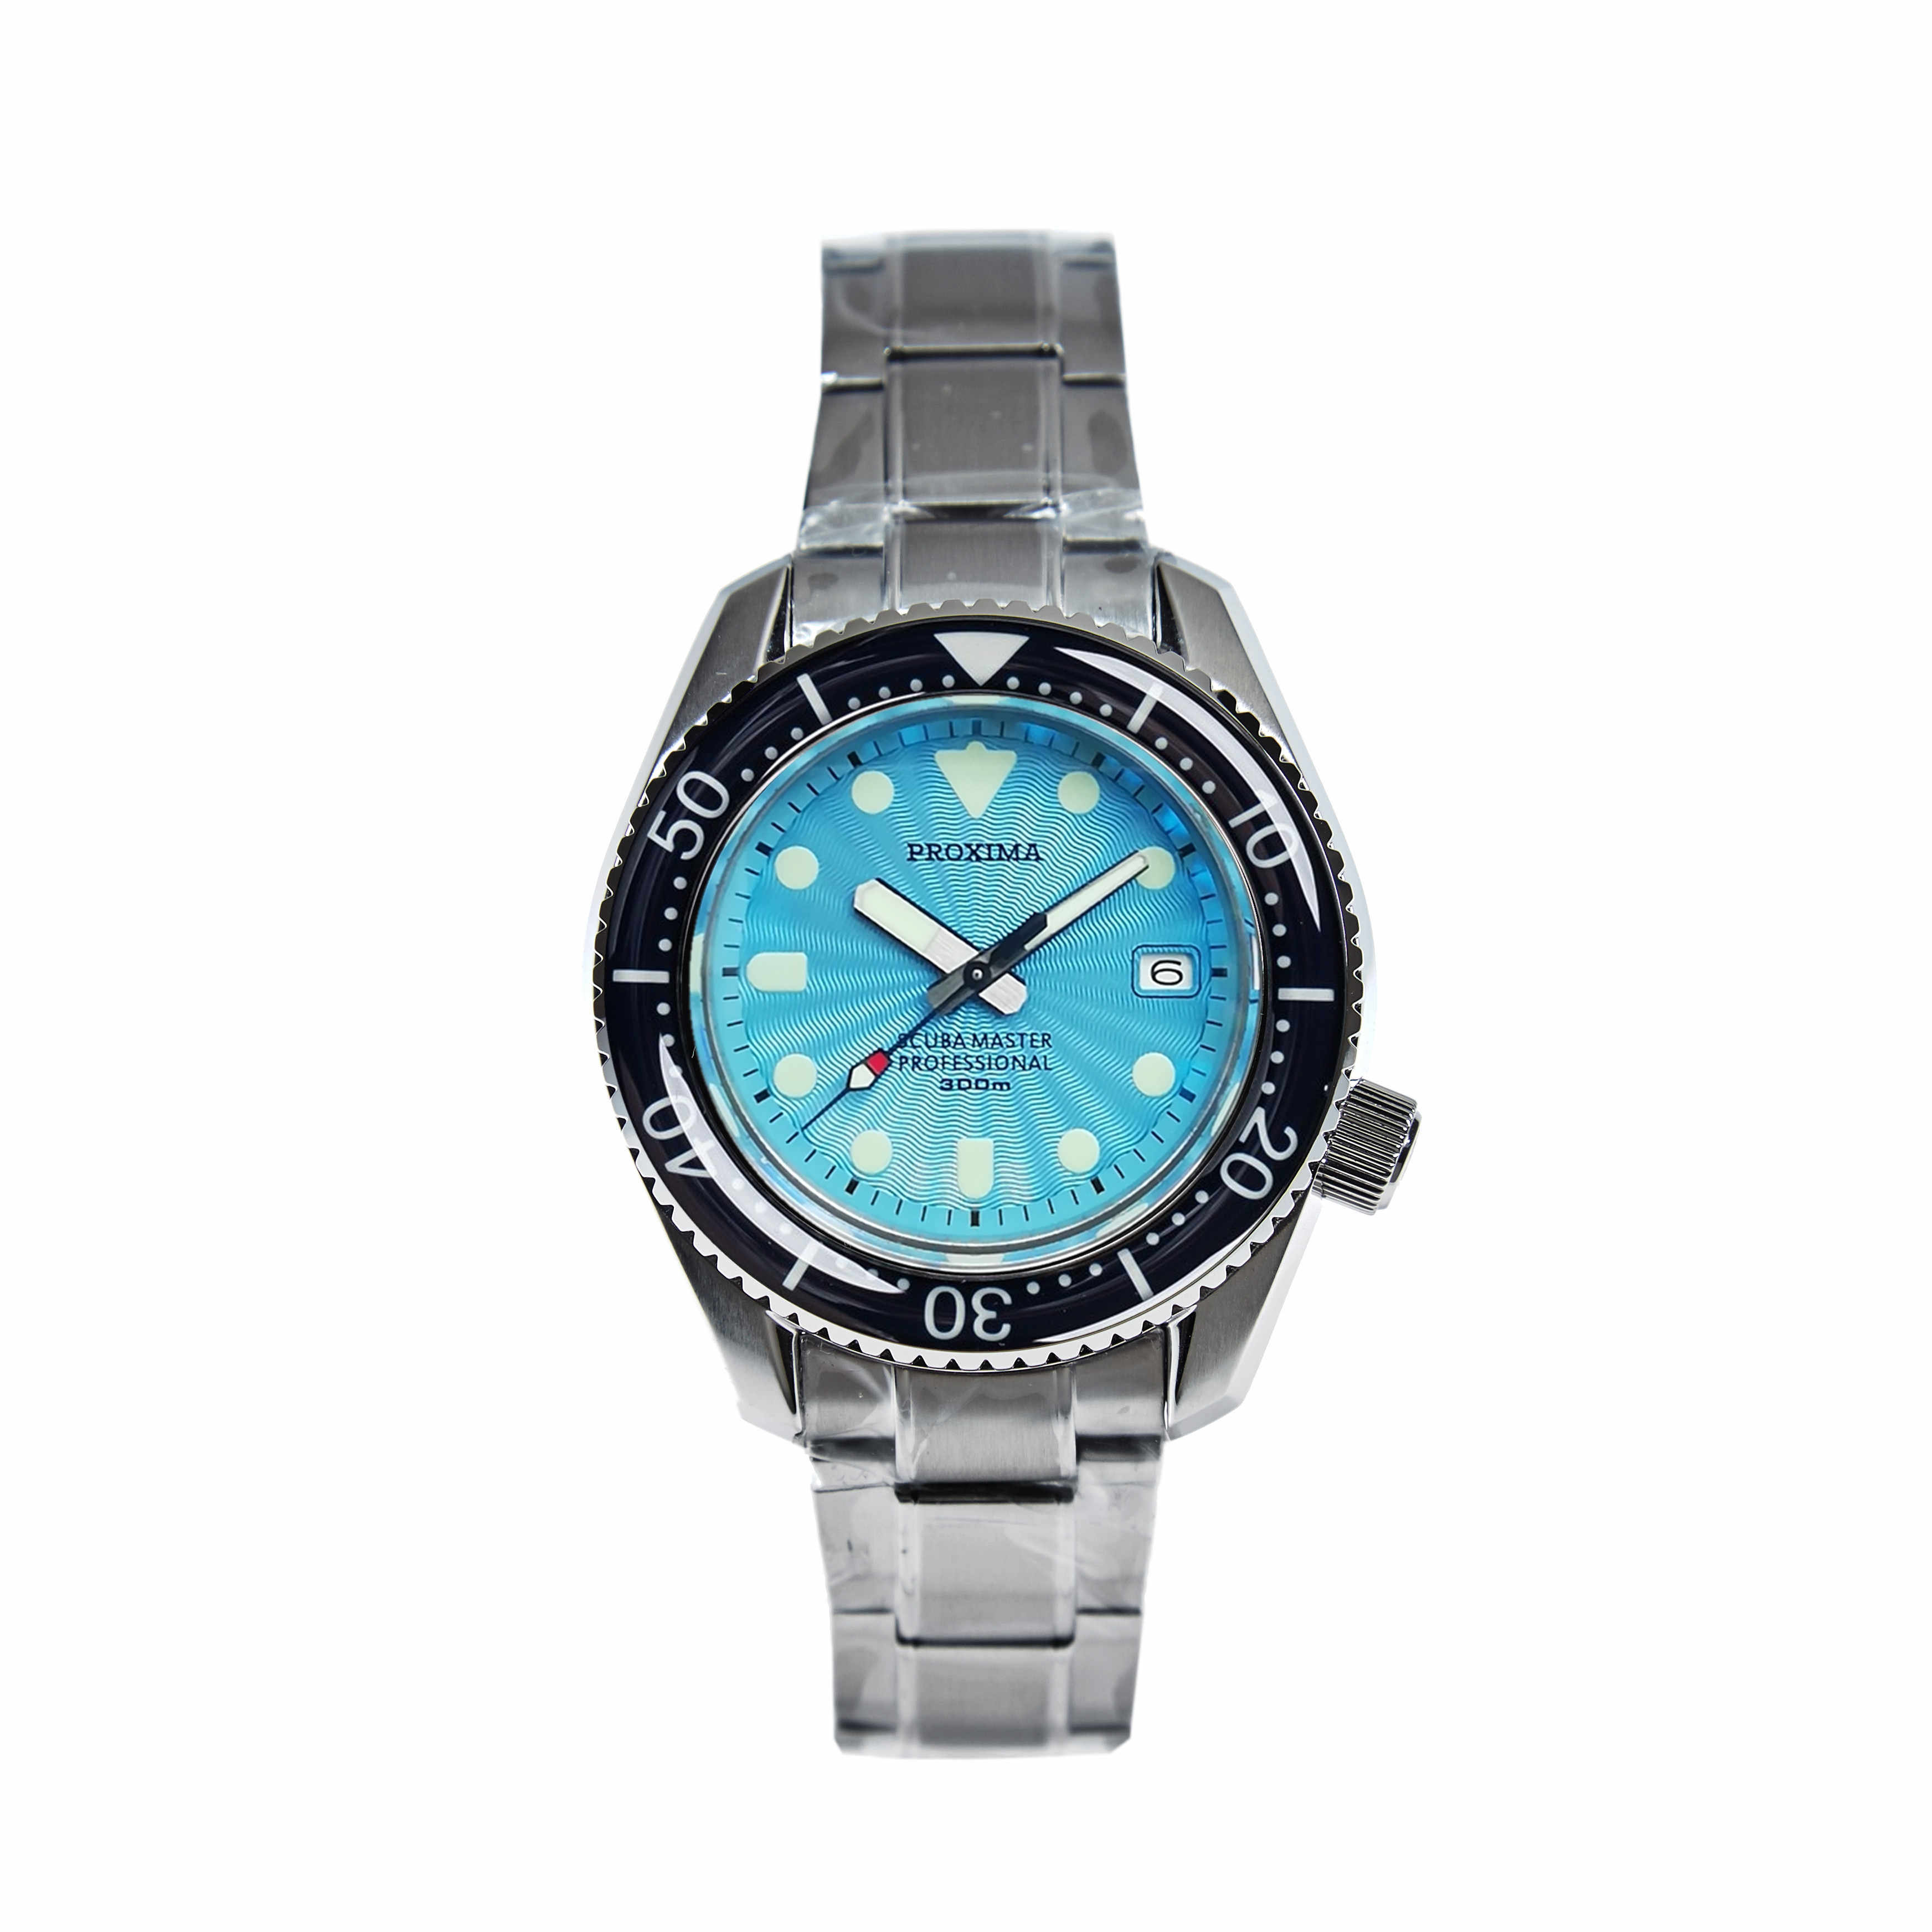 Proxima SBDX001 NH35 マグロダイバー自動腕時計 MarineMaste 波ブルーダイヤル V1